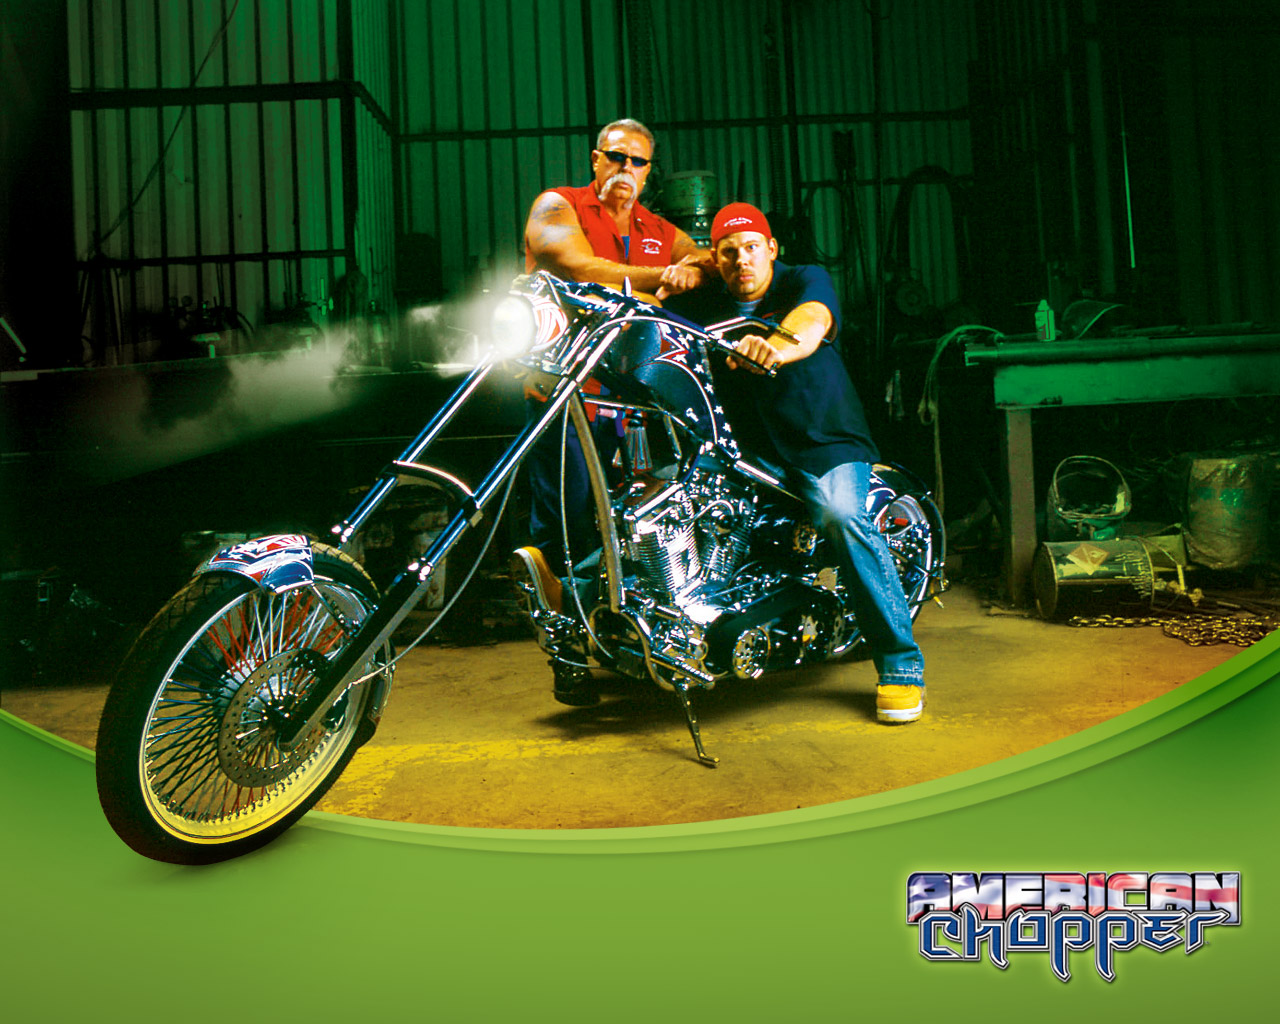 American chopper   Orange County Choppers Wallpaper 124425 1280x1024